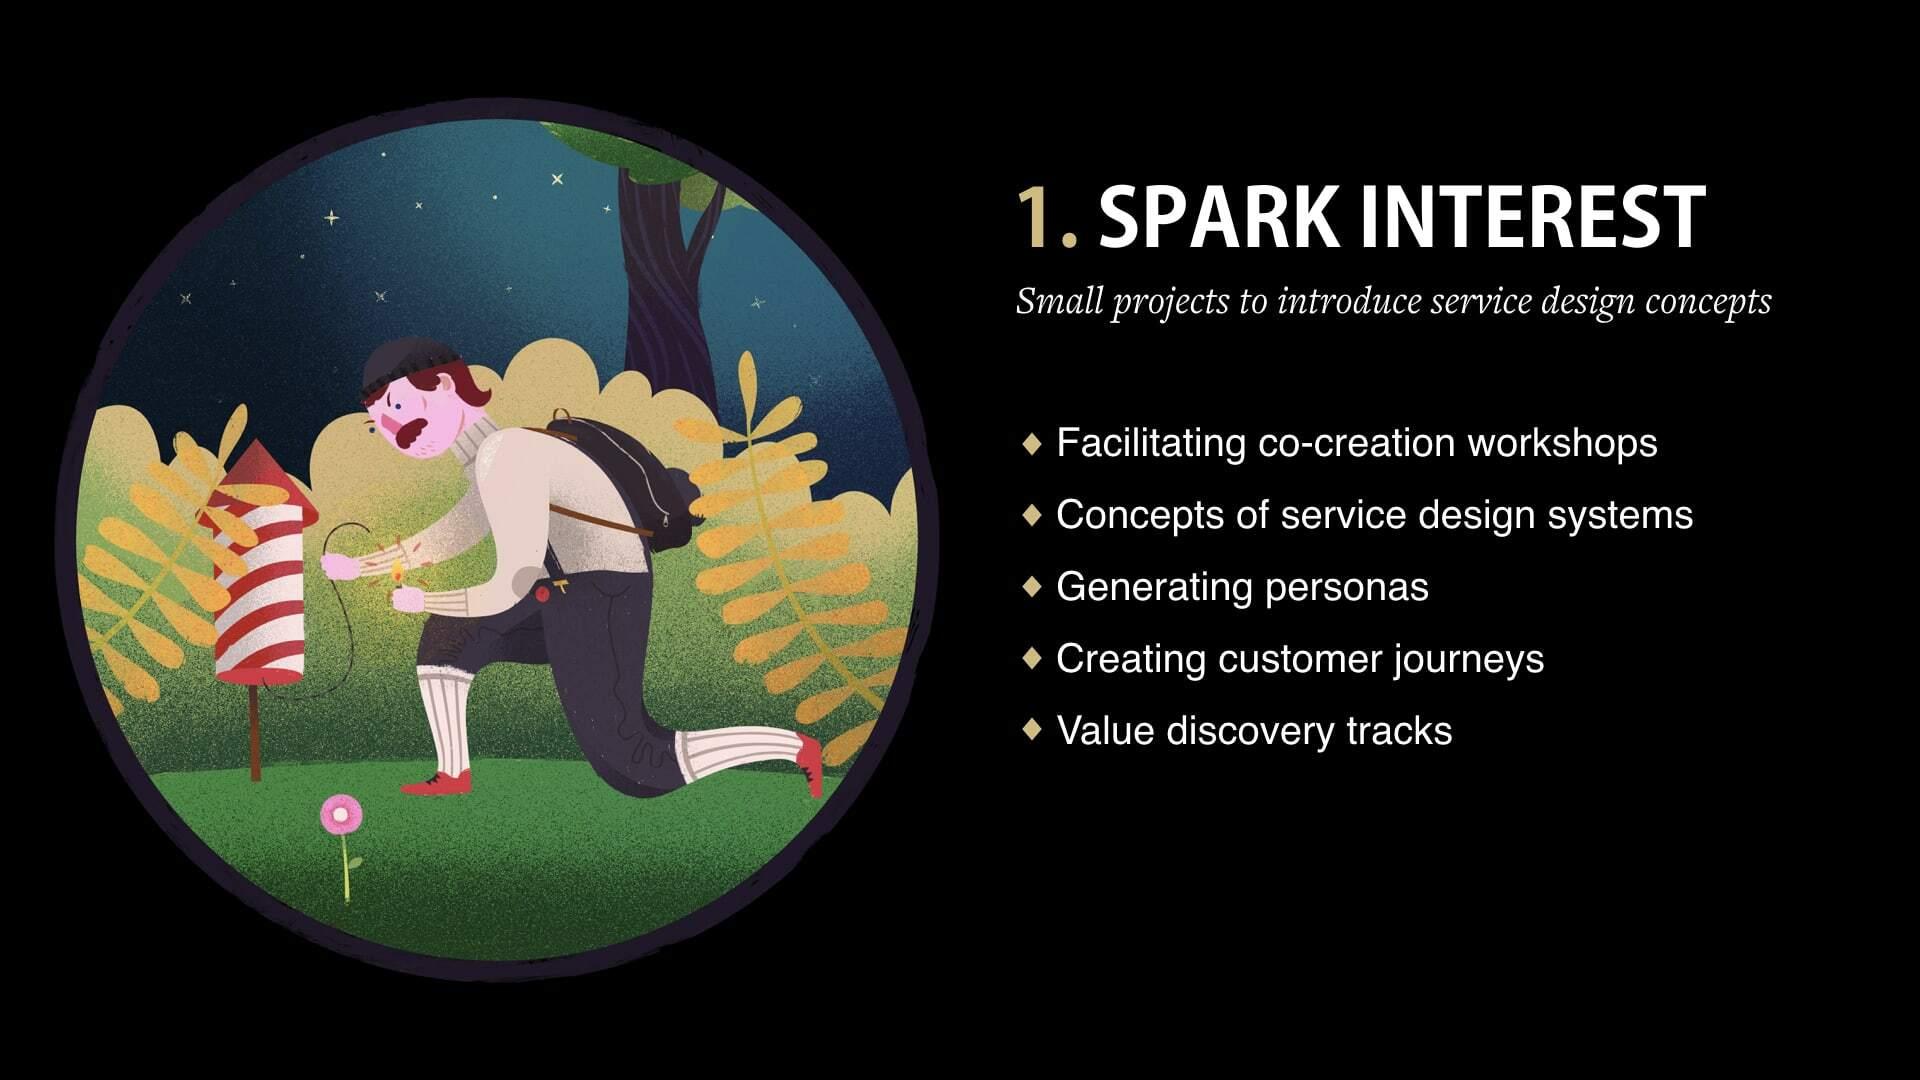 1 spark interest